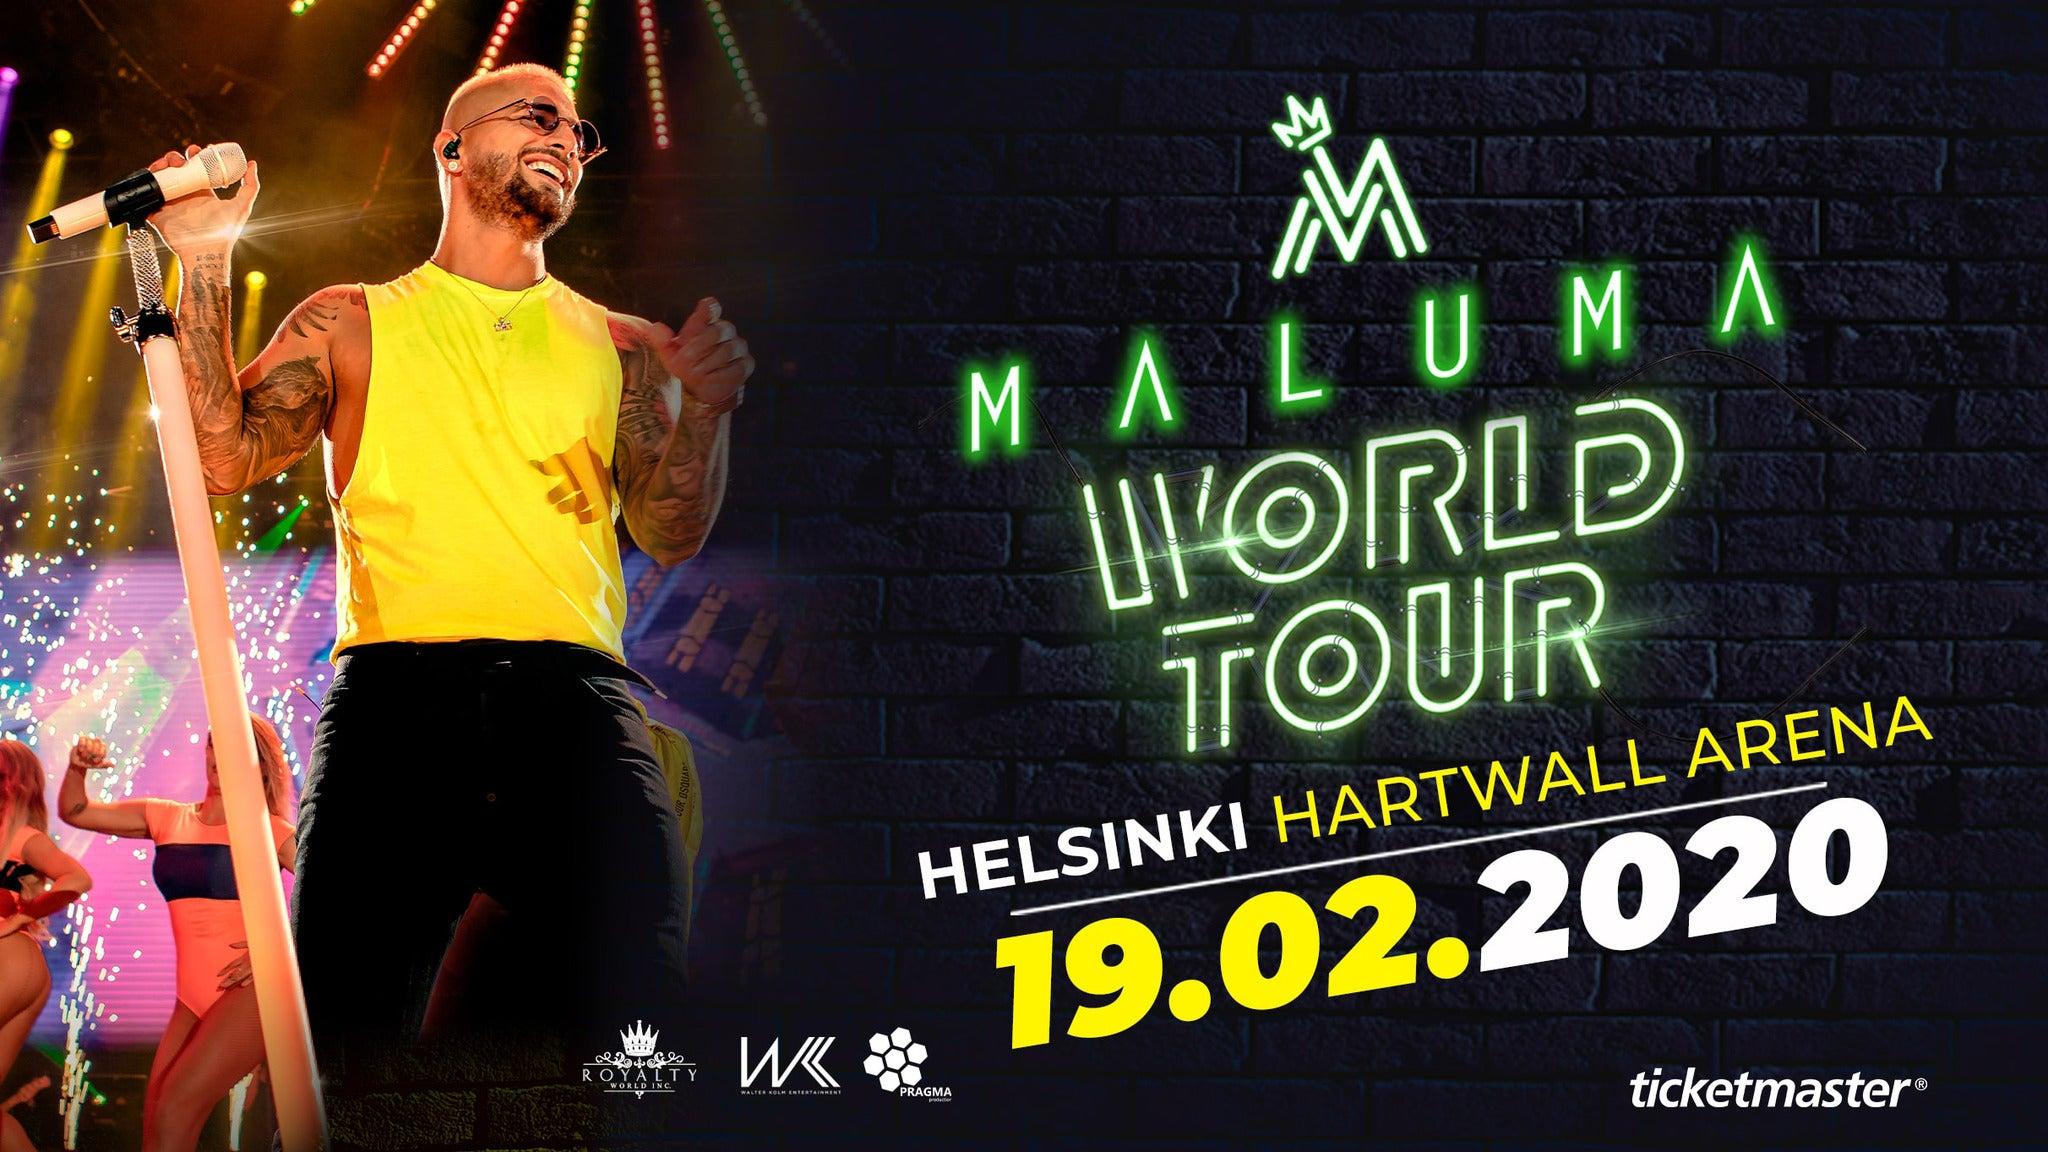 Maluma Tour 2020.Maluma Tickets Maluma Concert Tickets Tour Dates Ticketmaster Com